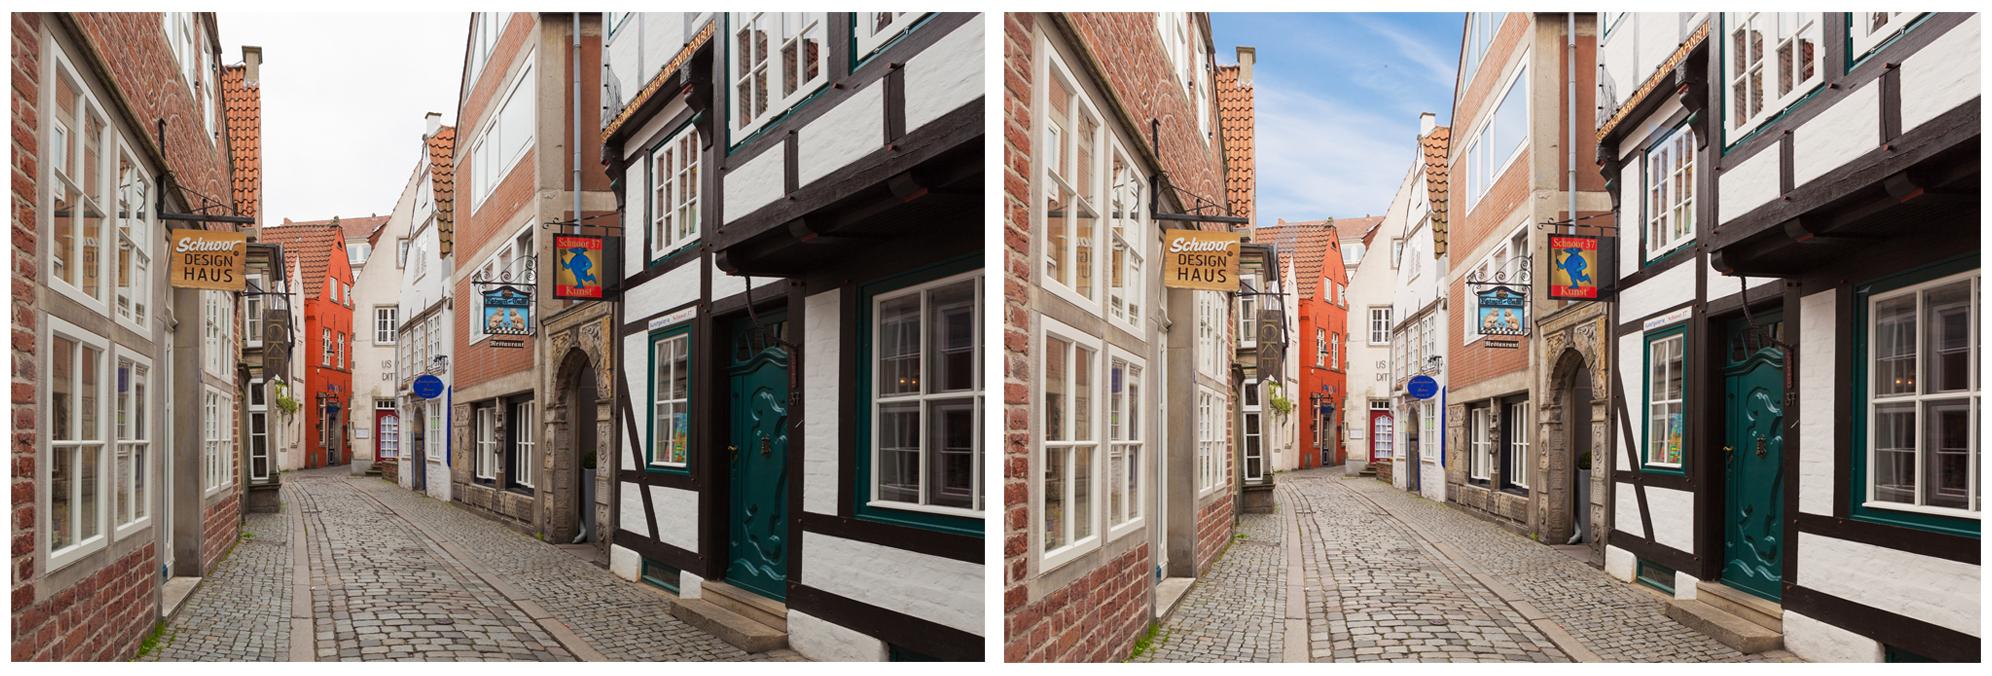 Fotokurs, Photoshop, Bremen, Bildbearbeitung